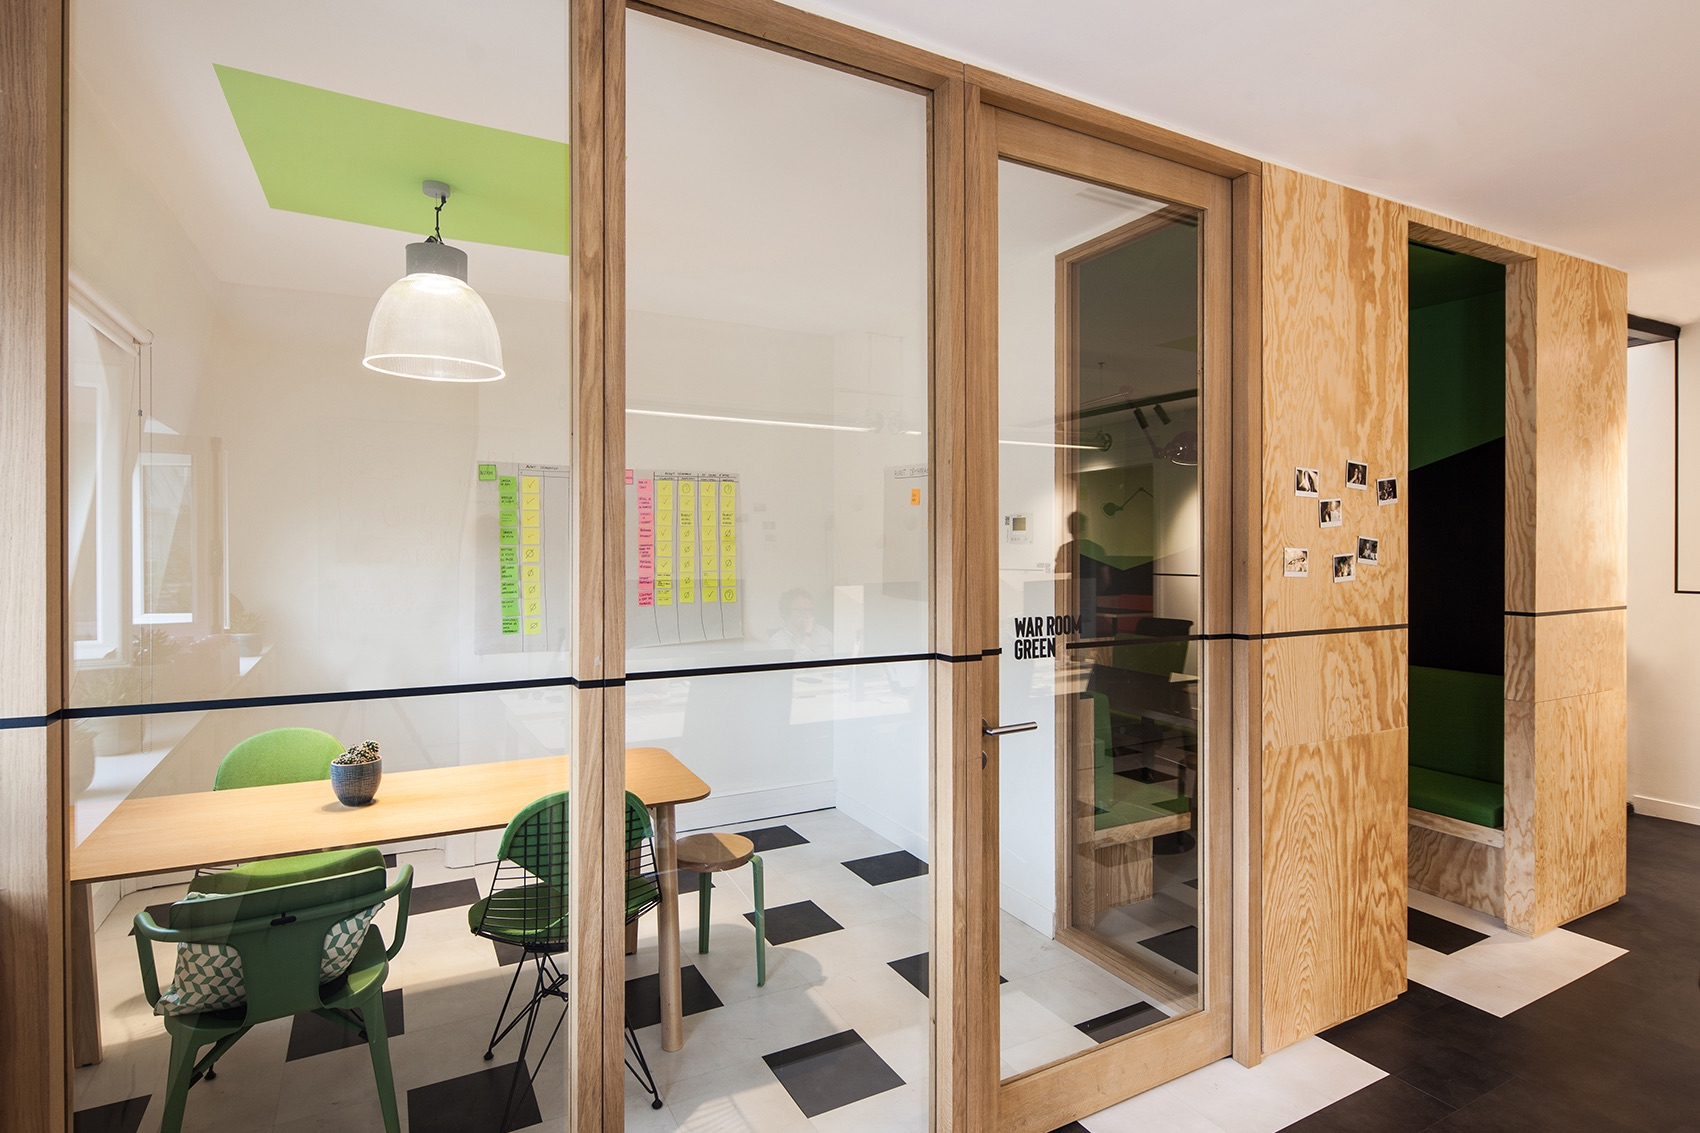 pwc-paris-office-31